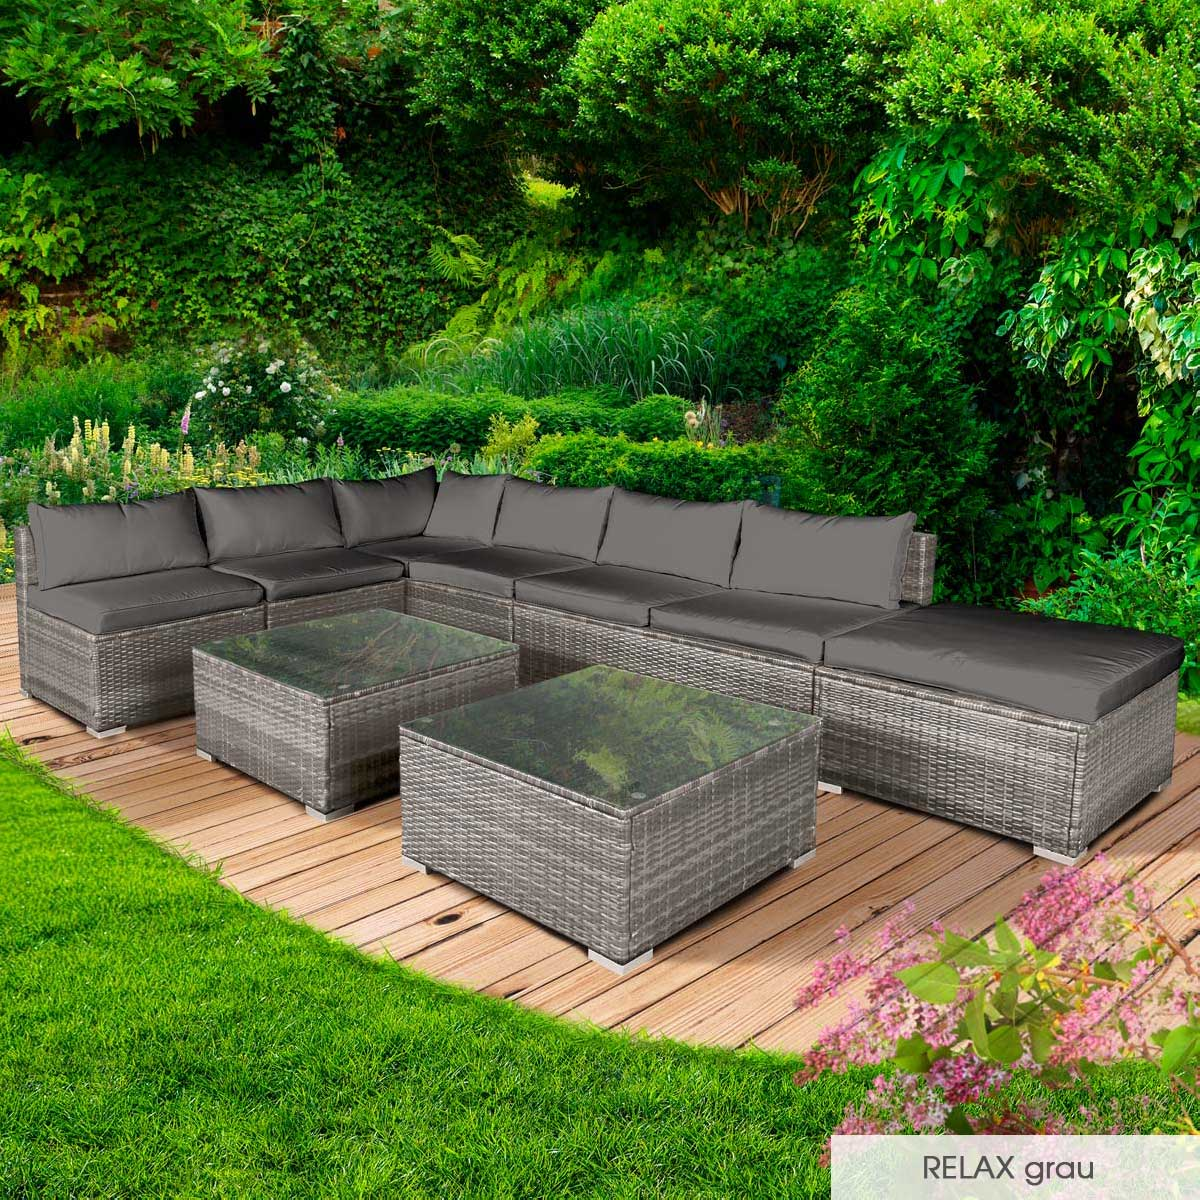 Gartenmoebel-Poly-Rattan-Lounge-Moebel-Sitzgarnitur-Gartengarnitur-Sitzgruppe-Sofa Indexbild 30